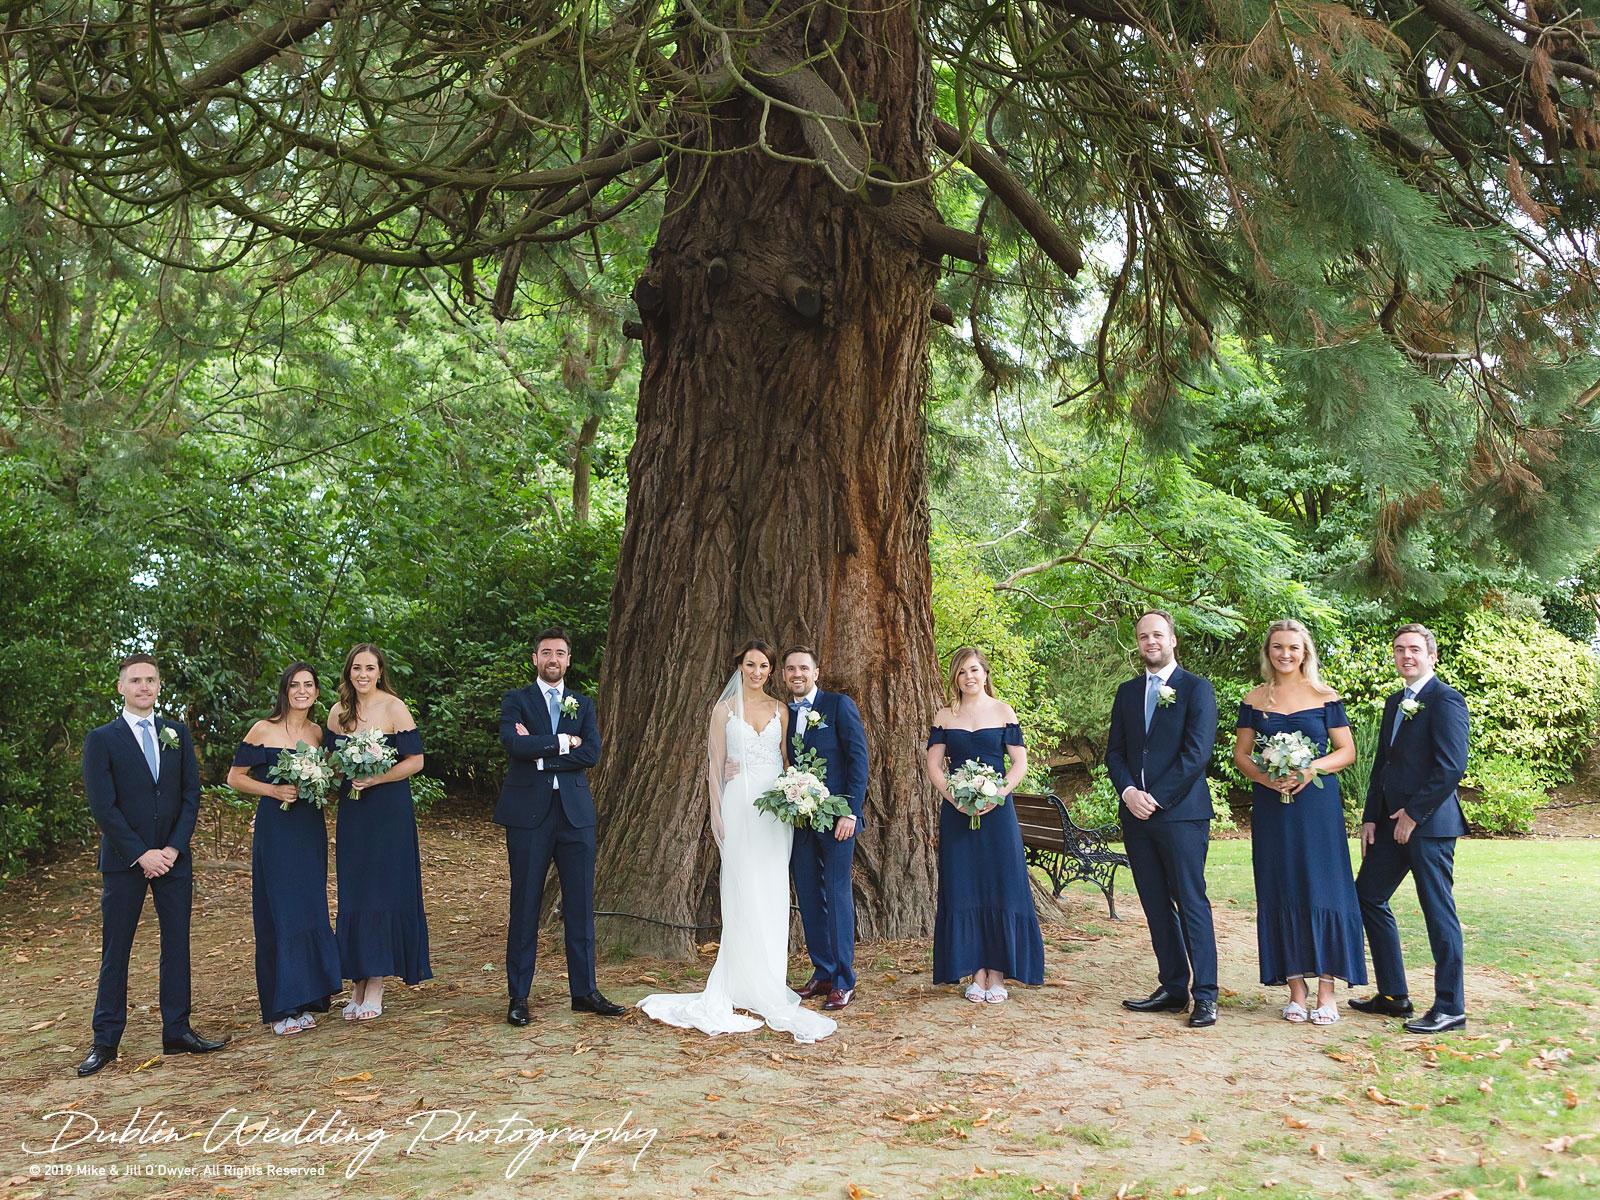 wedding-photographers-wicklow-tinakilly-house-2019-53.jpg